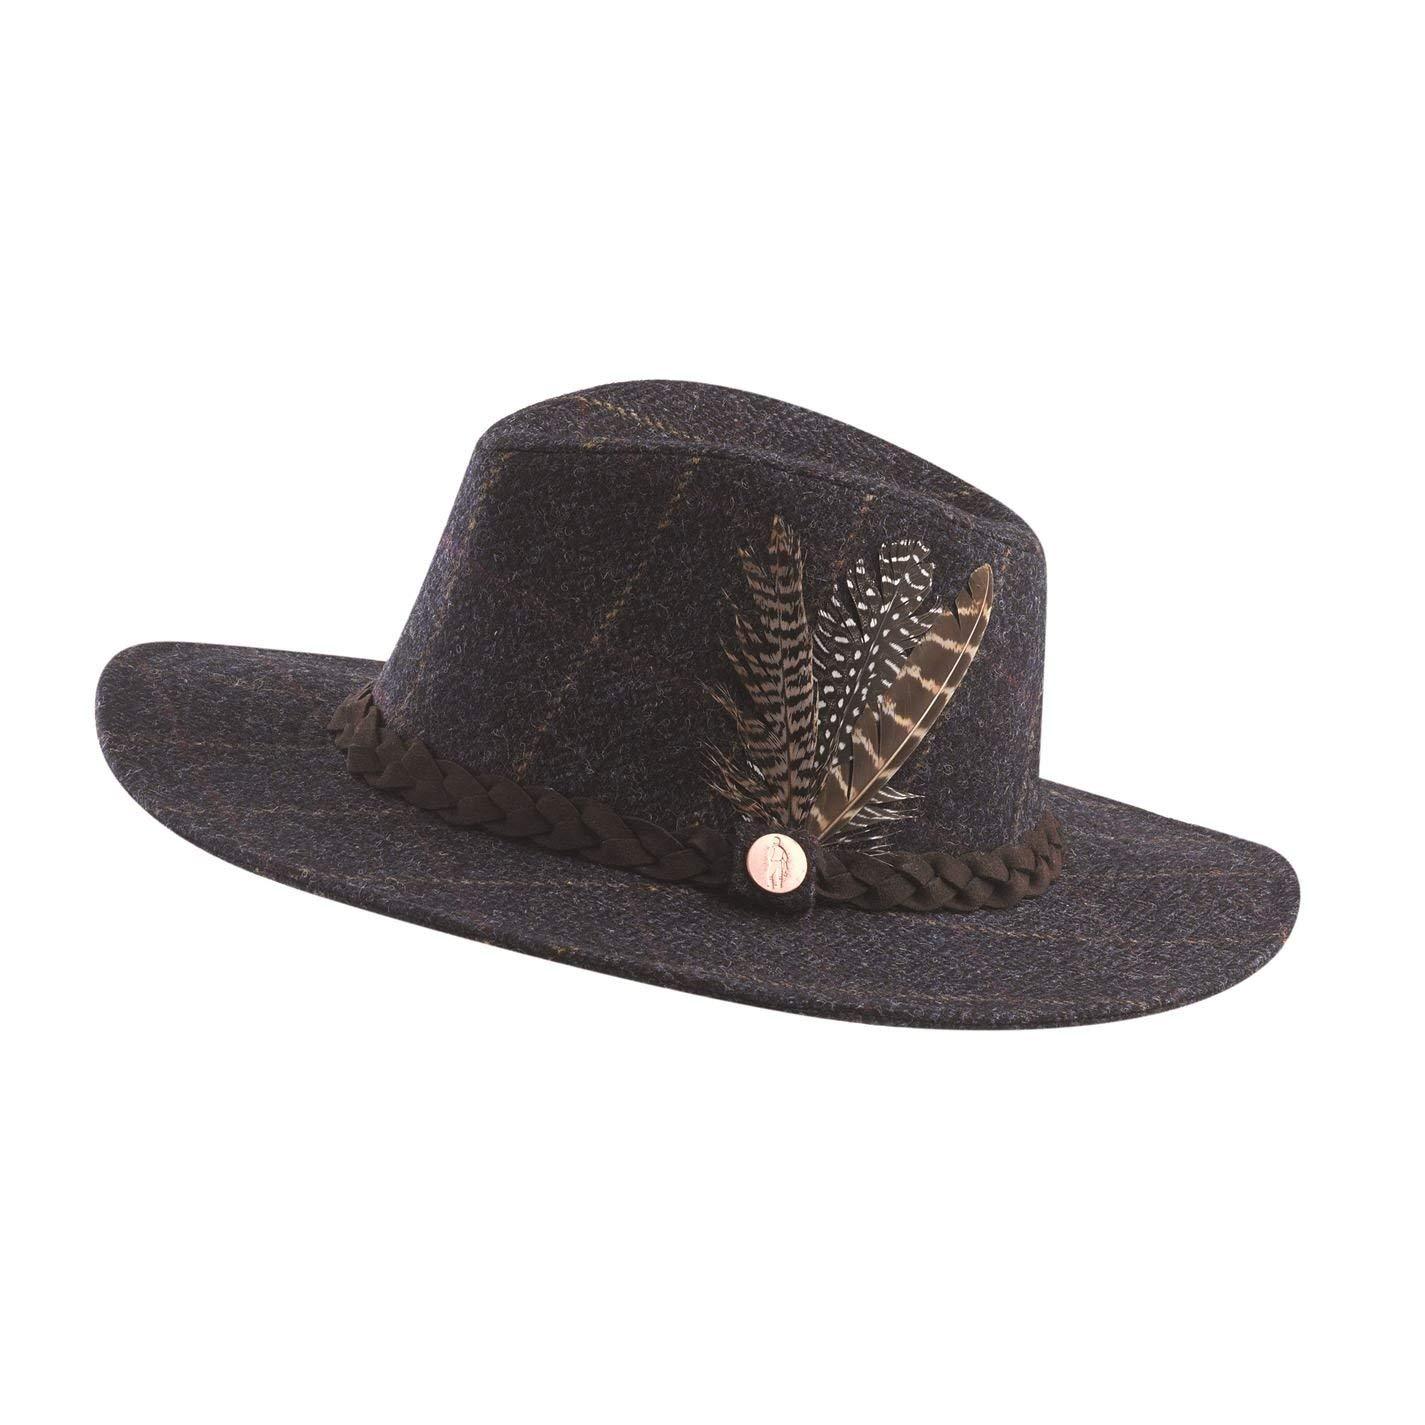 06699be1e42d8 Get Quotations · Jack Murphy Unisex Dakota Dream Hat Classic